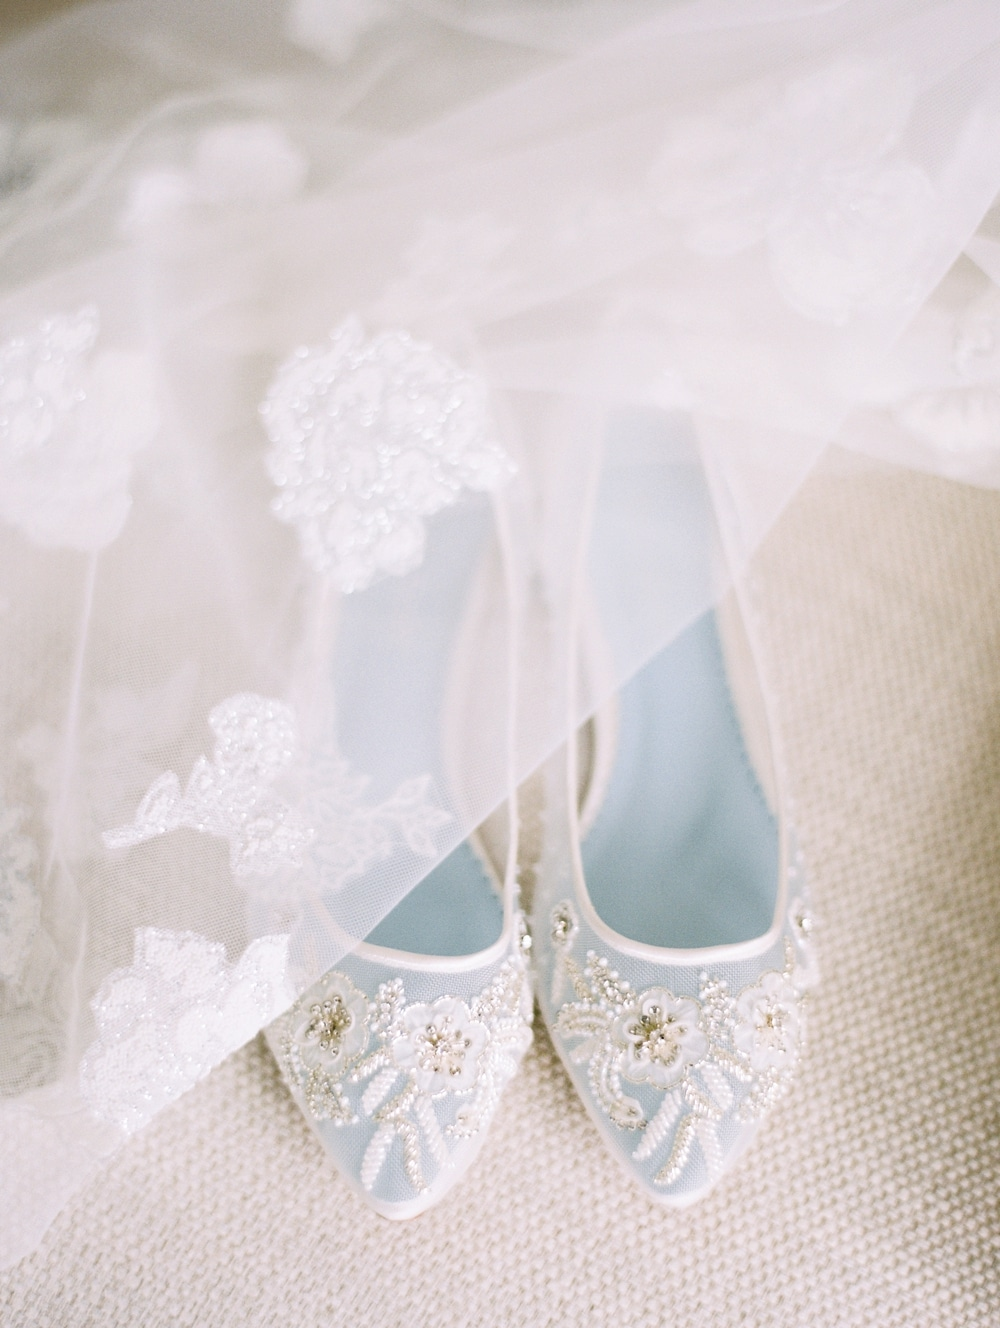 Kristin-La-Voie-Photography-salvatore's-chicago-wedding-photographer-76